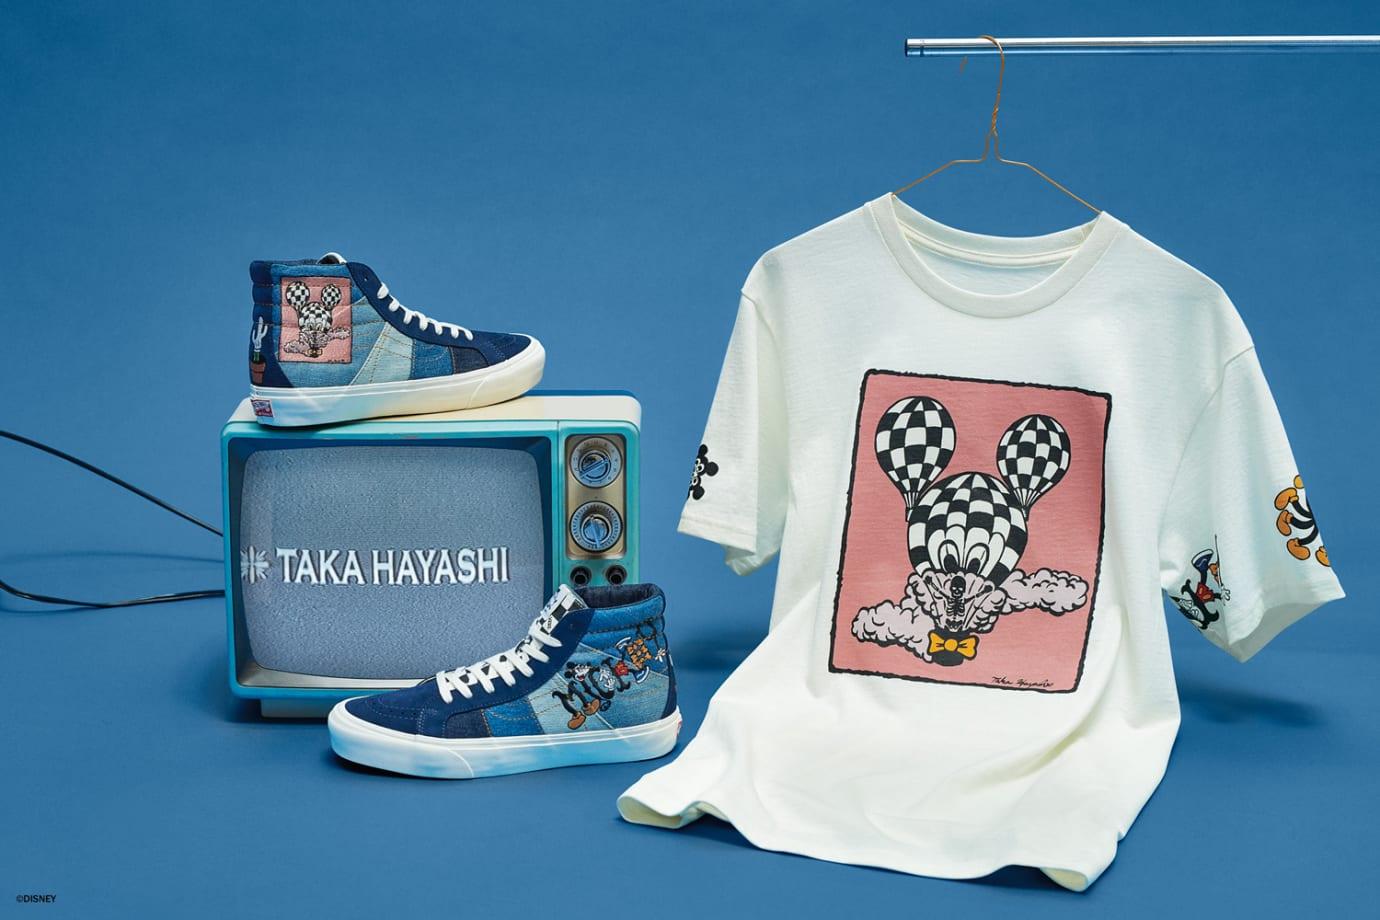 Vans Vault x Disney (Taka Hayashi)